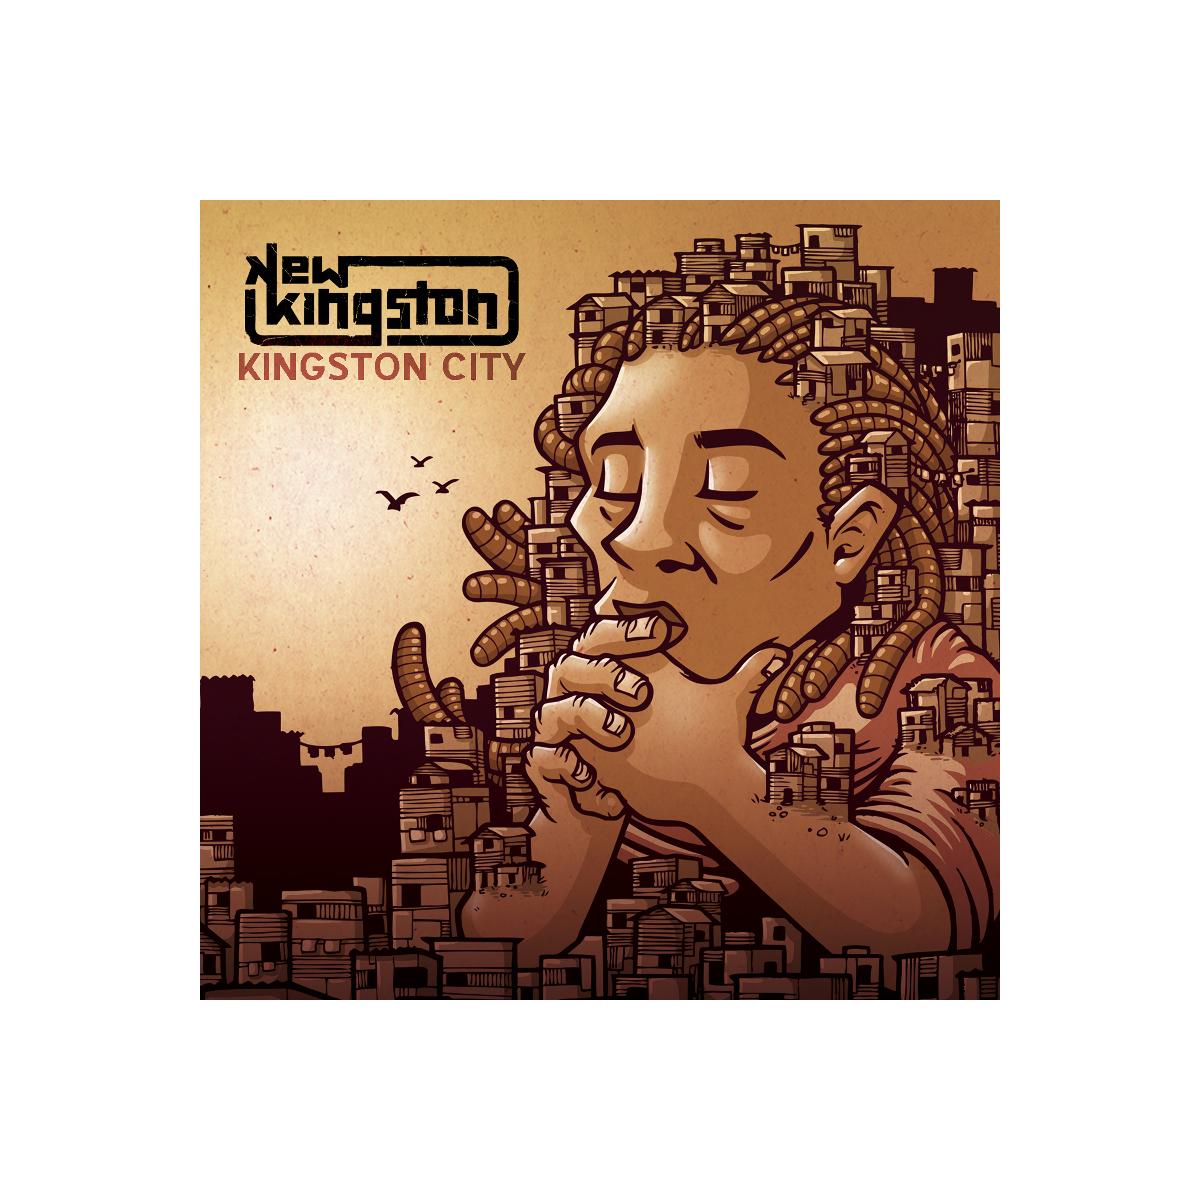 New Kingston - Kingston City Digital Download